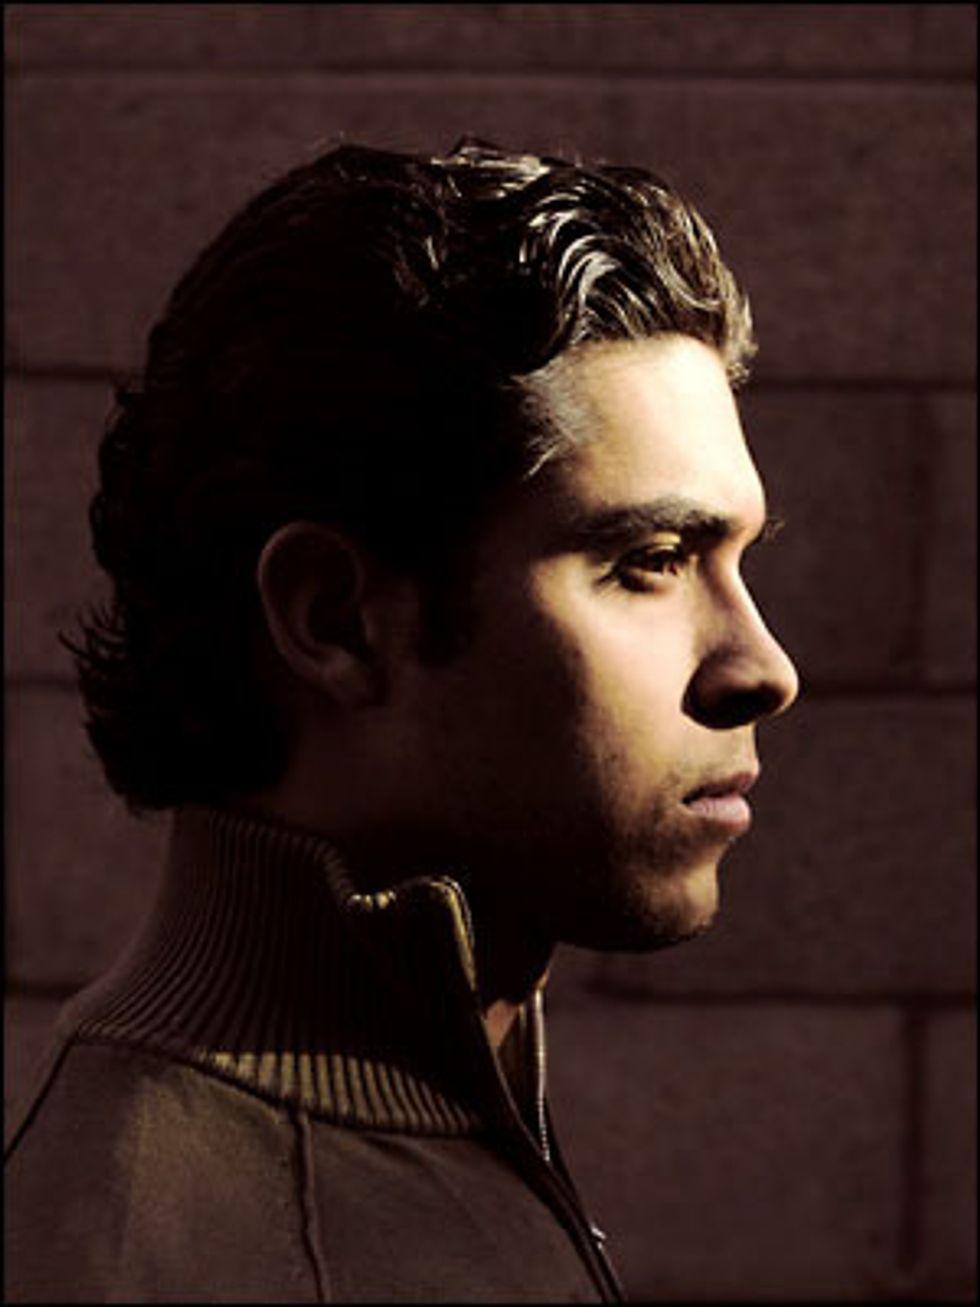 Beautiful People 2004: Wilmer Valderrama